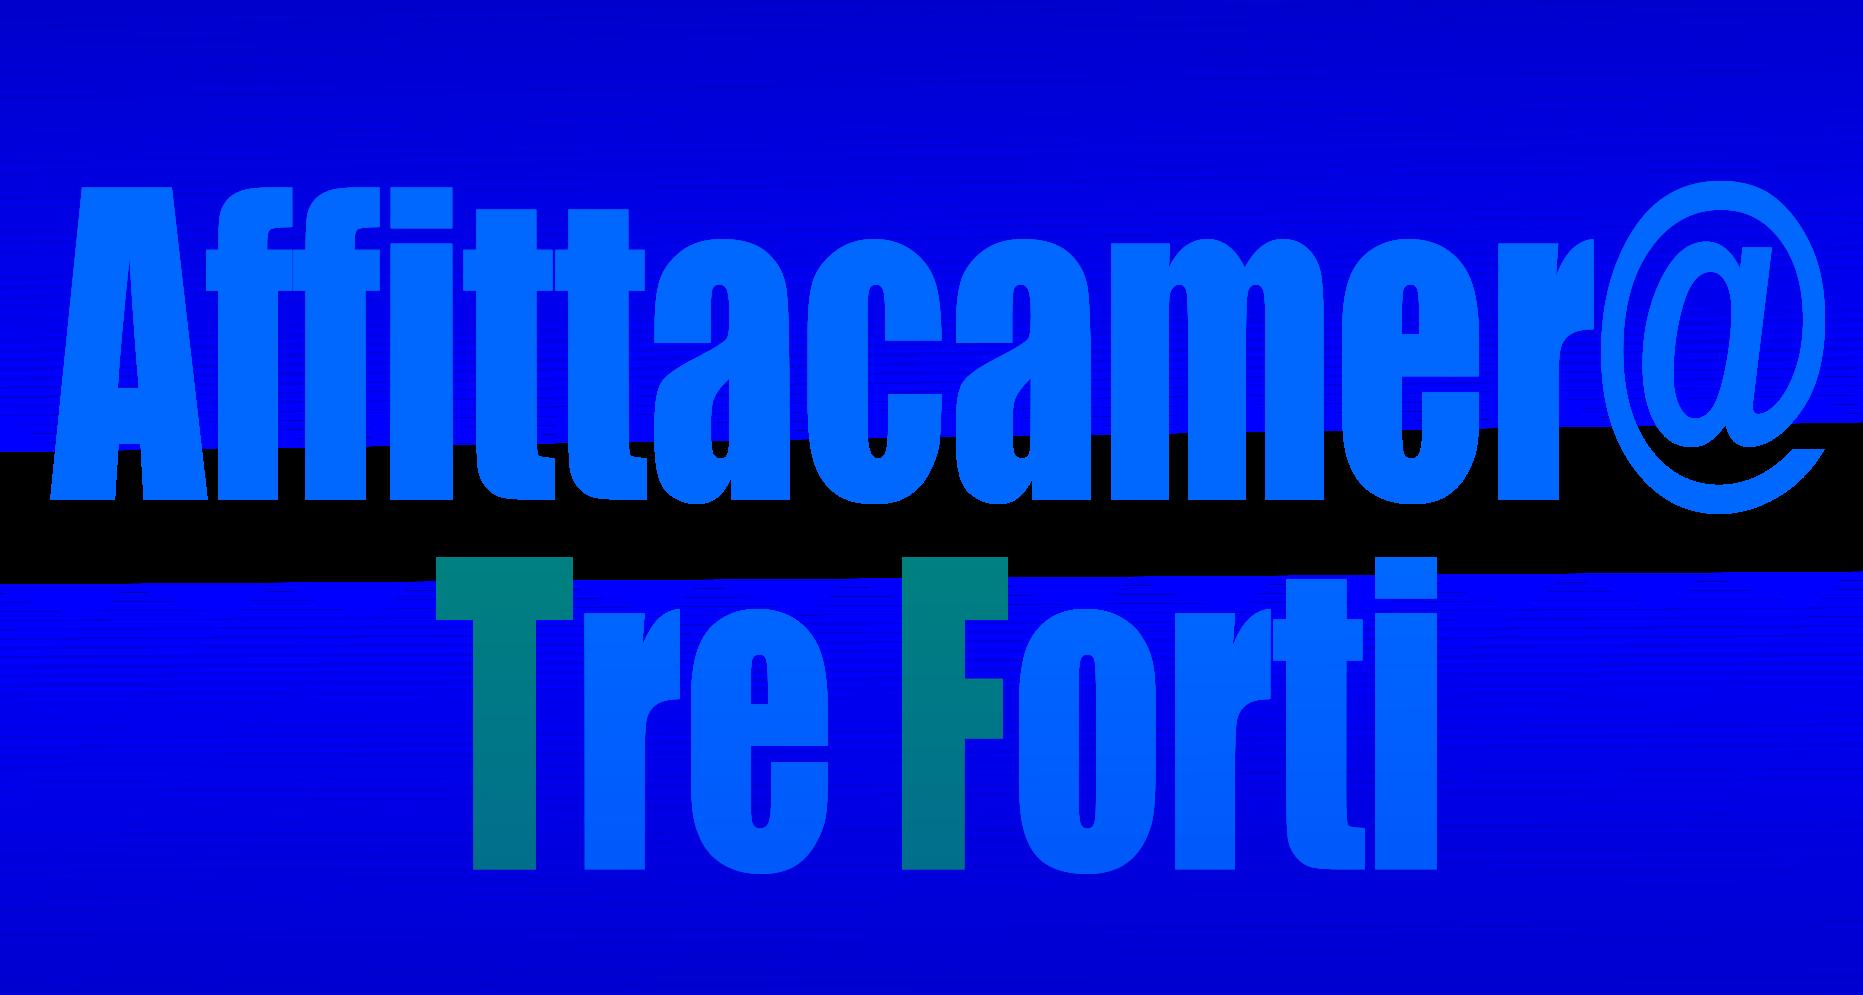 Affittacamere Tre Forti